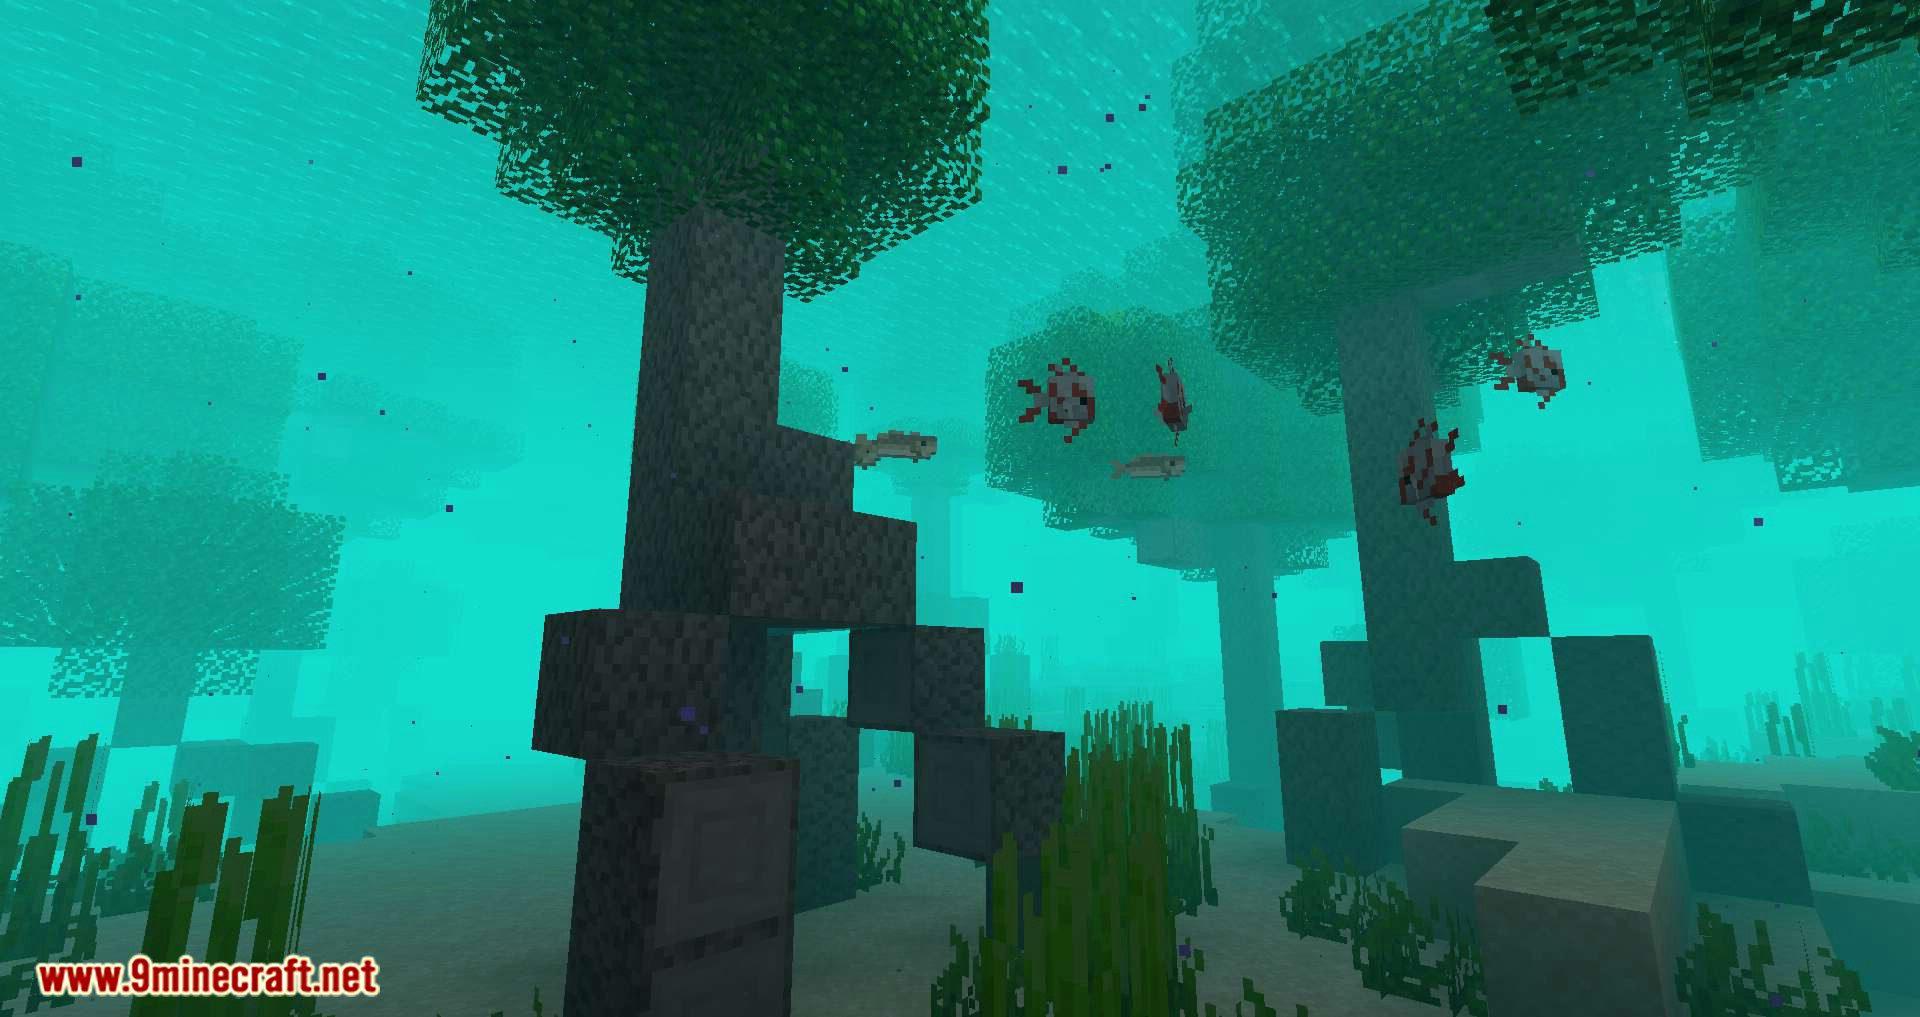 underwater mod biome minecraft biomes ocean torch 9minecraft source tech features tree